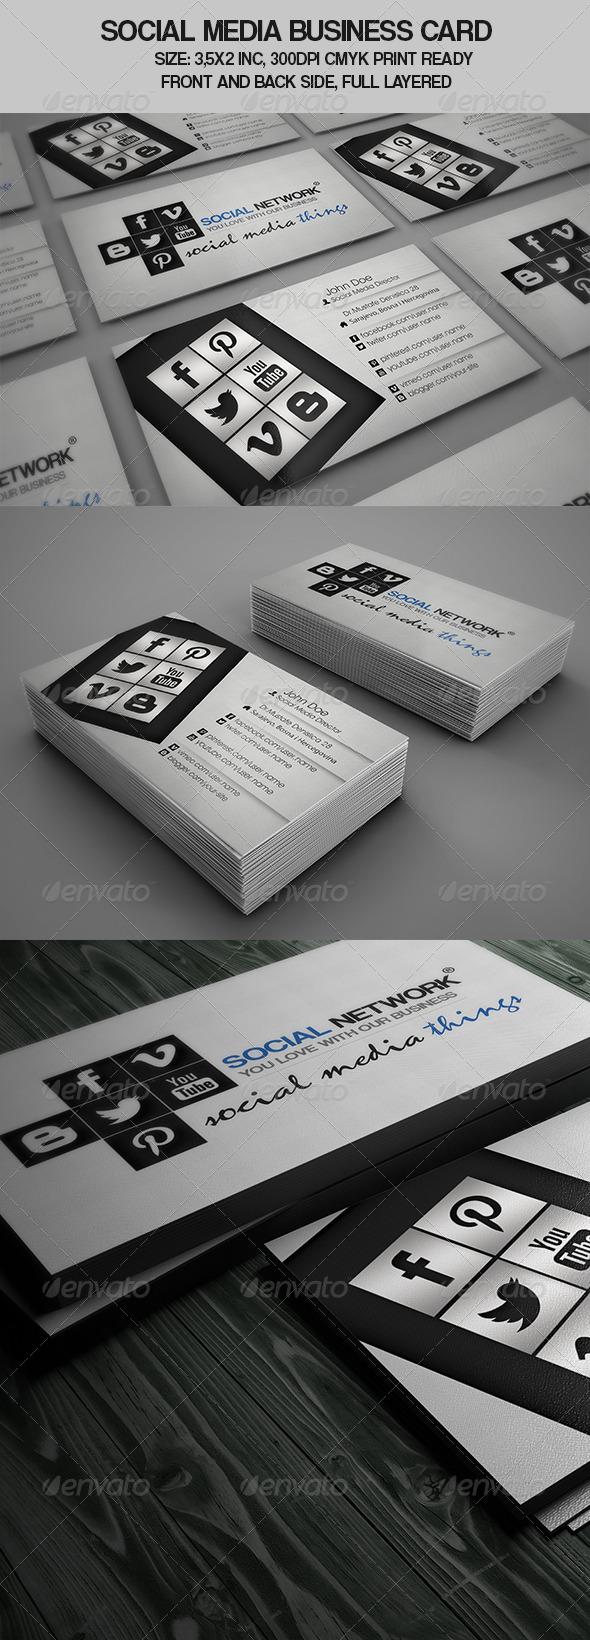 Social Media Business Card - Creative Business Cards